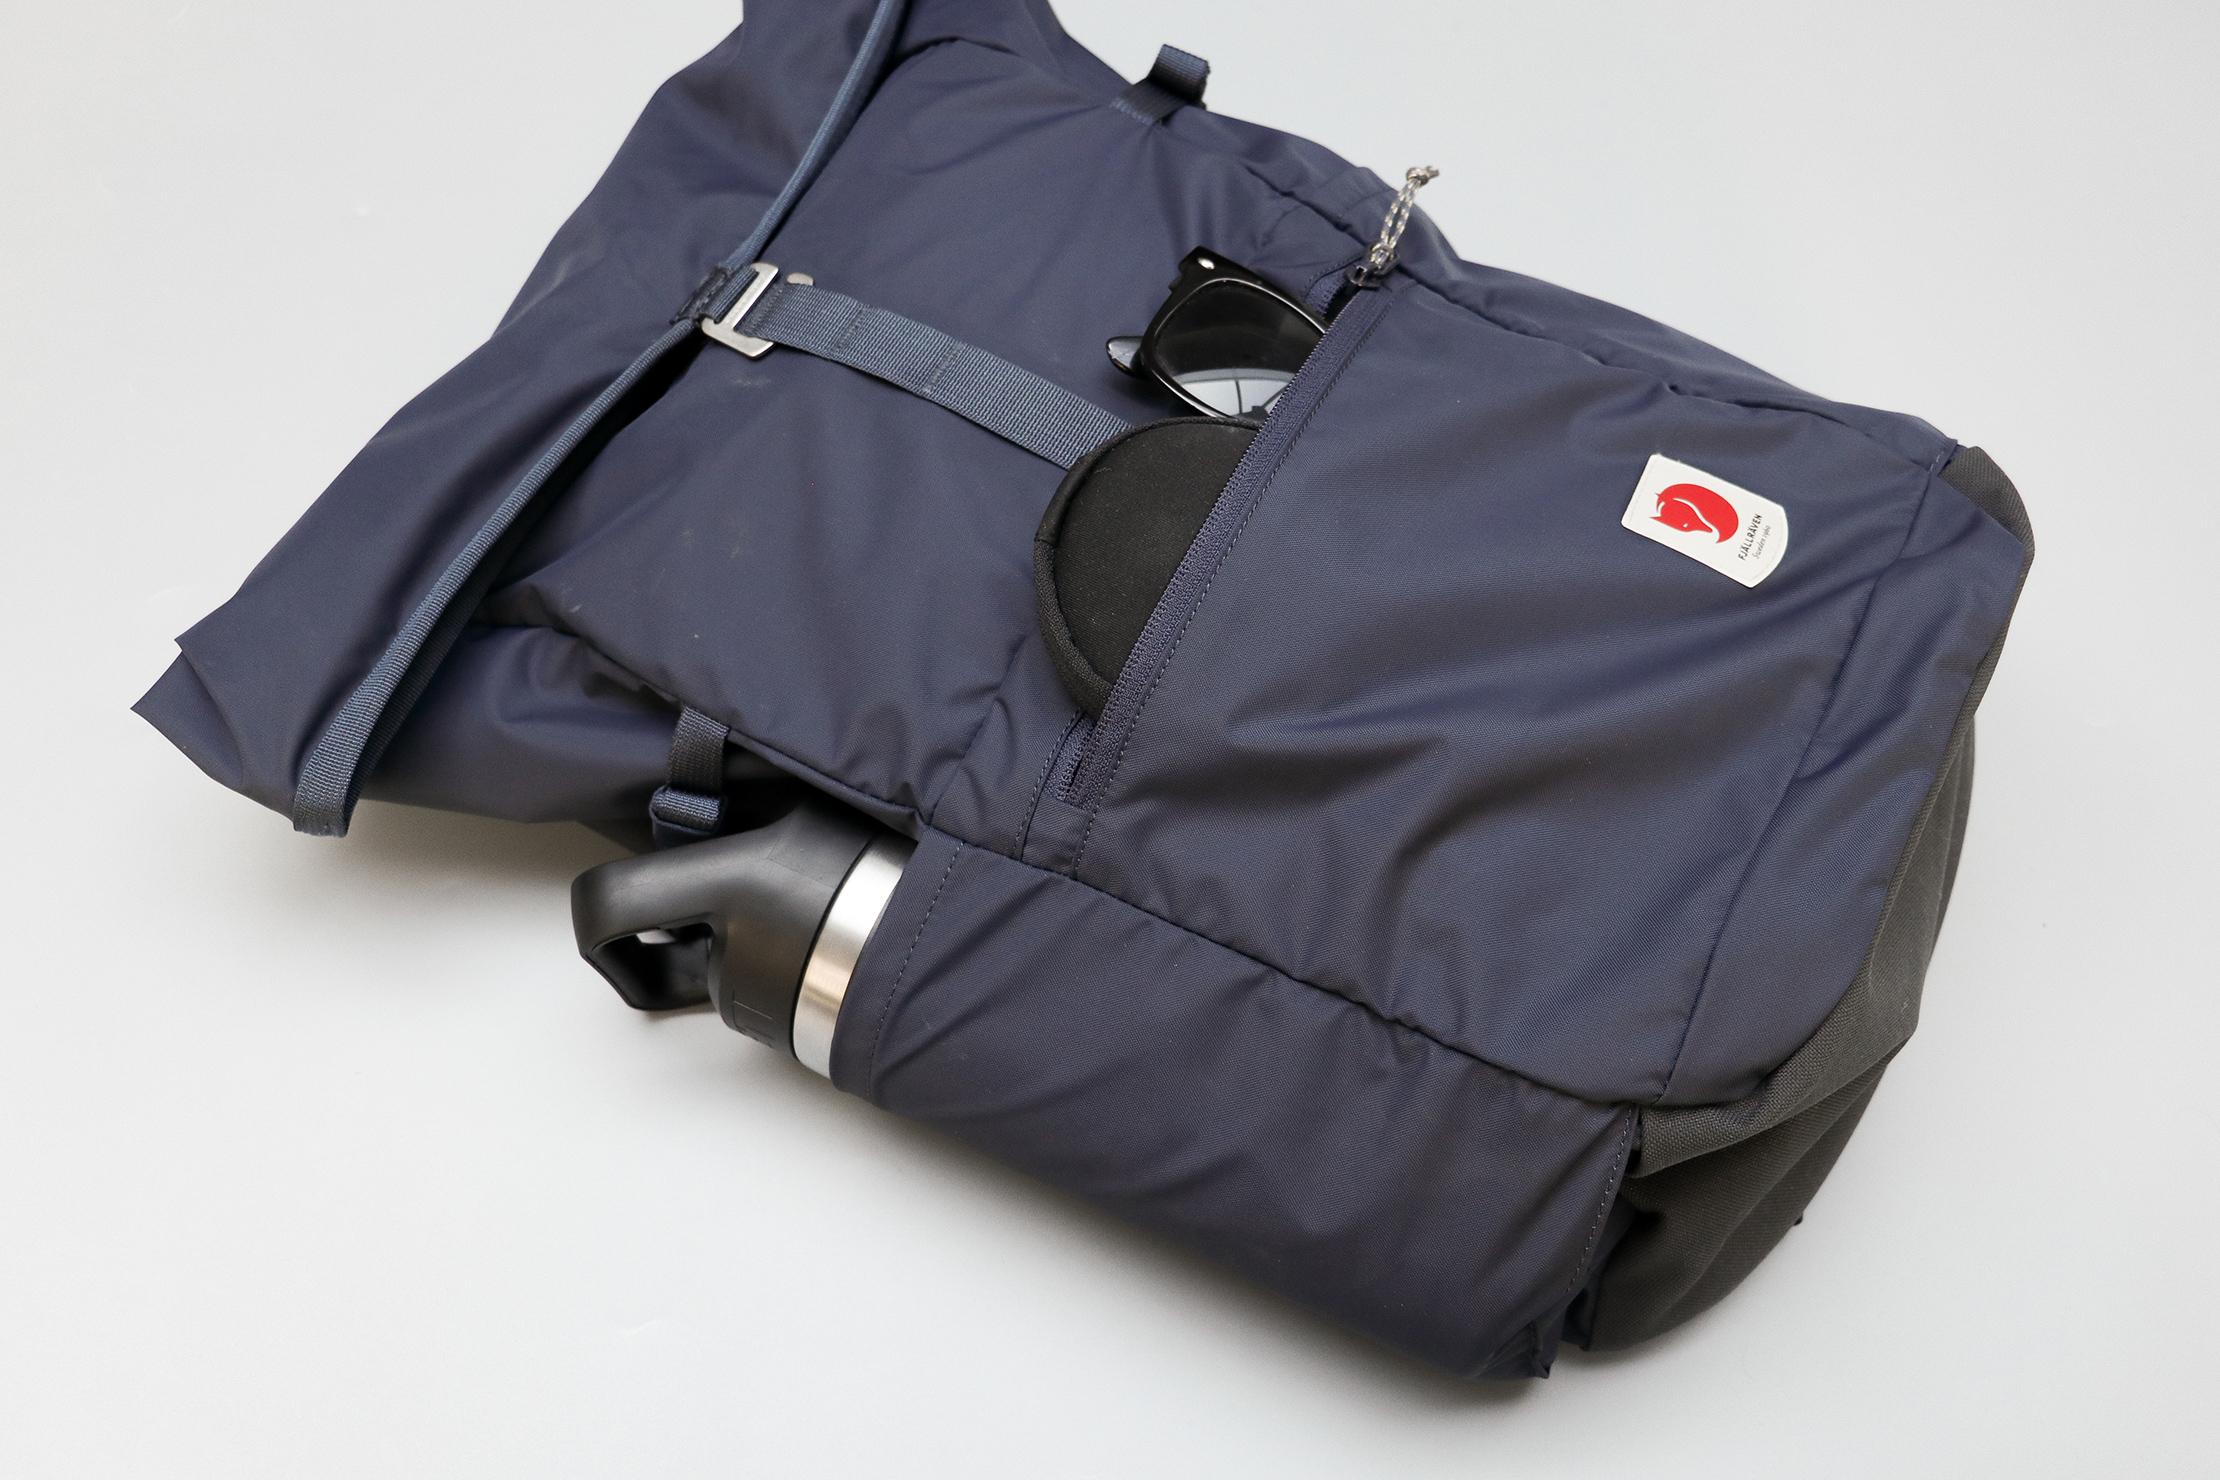 Fjallraven High Coast Foldsack 24 Water Bottle and Front Pocket